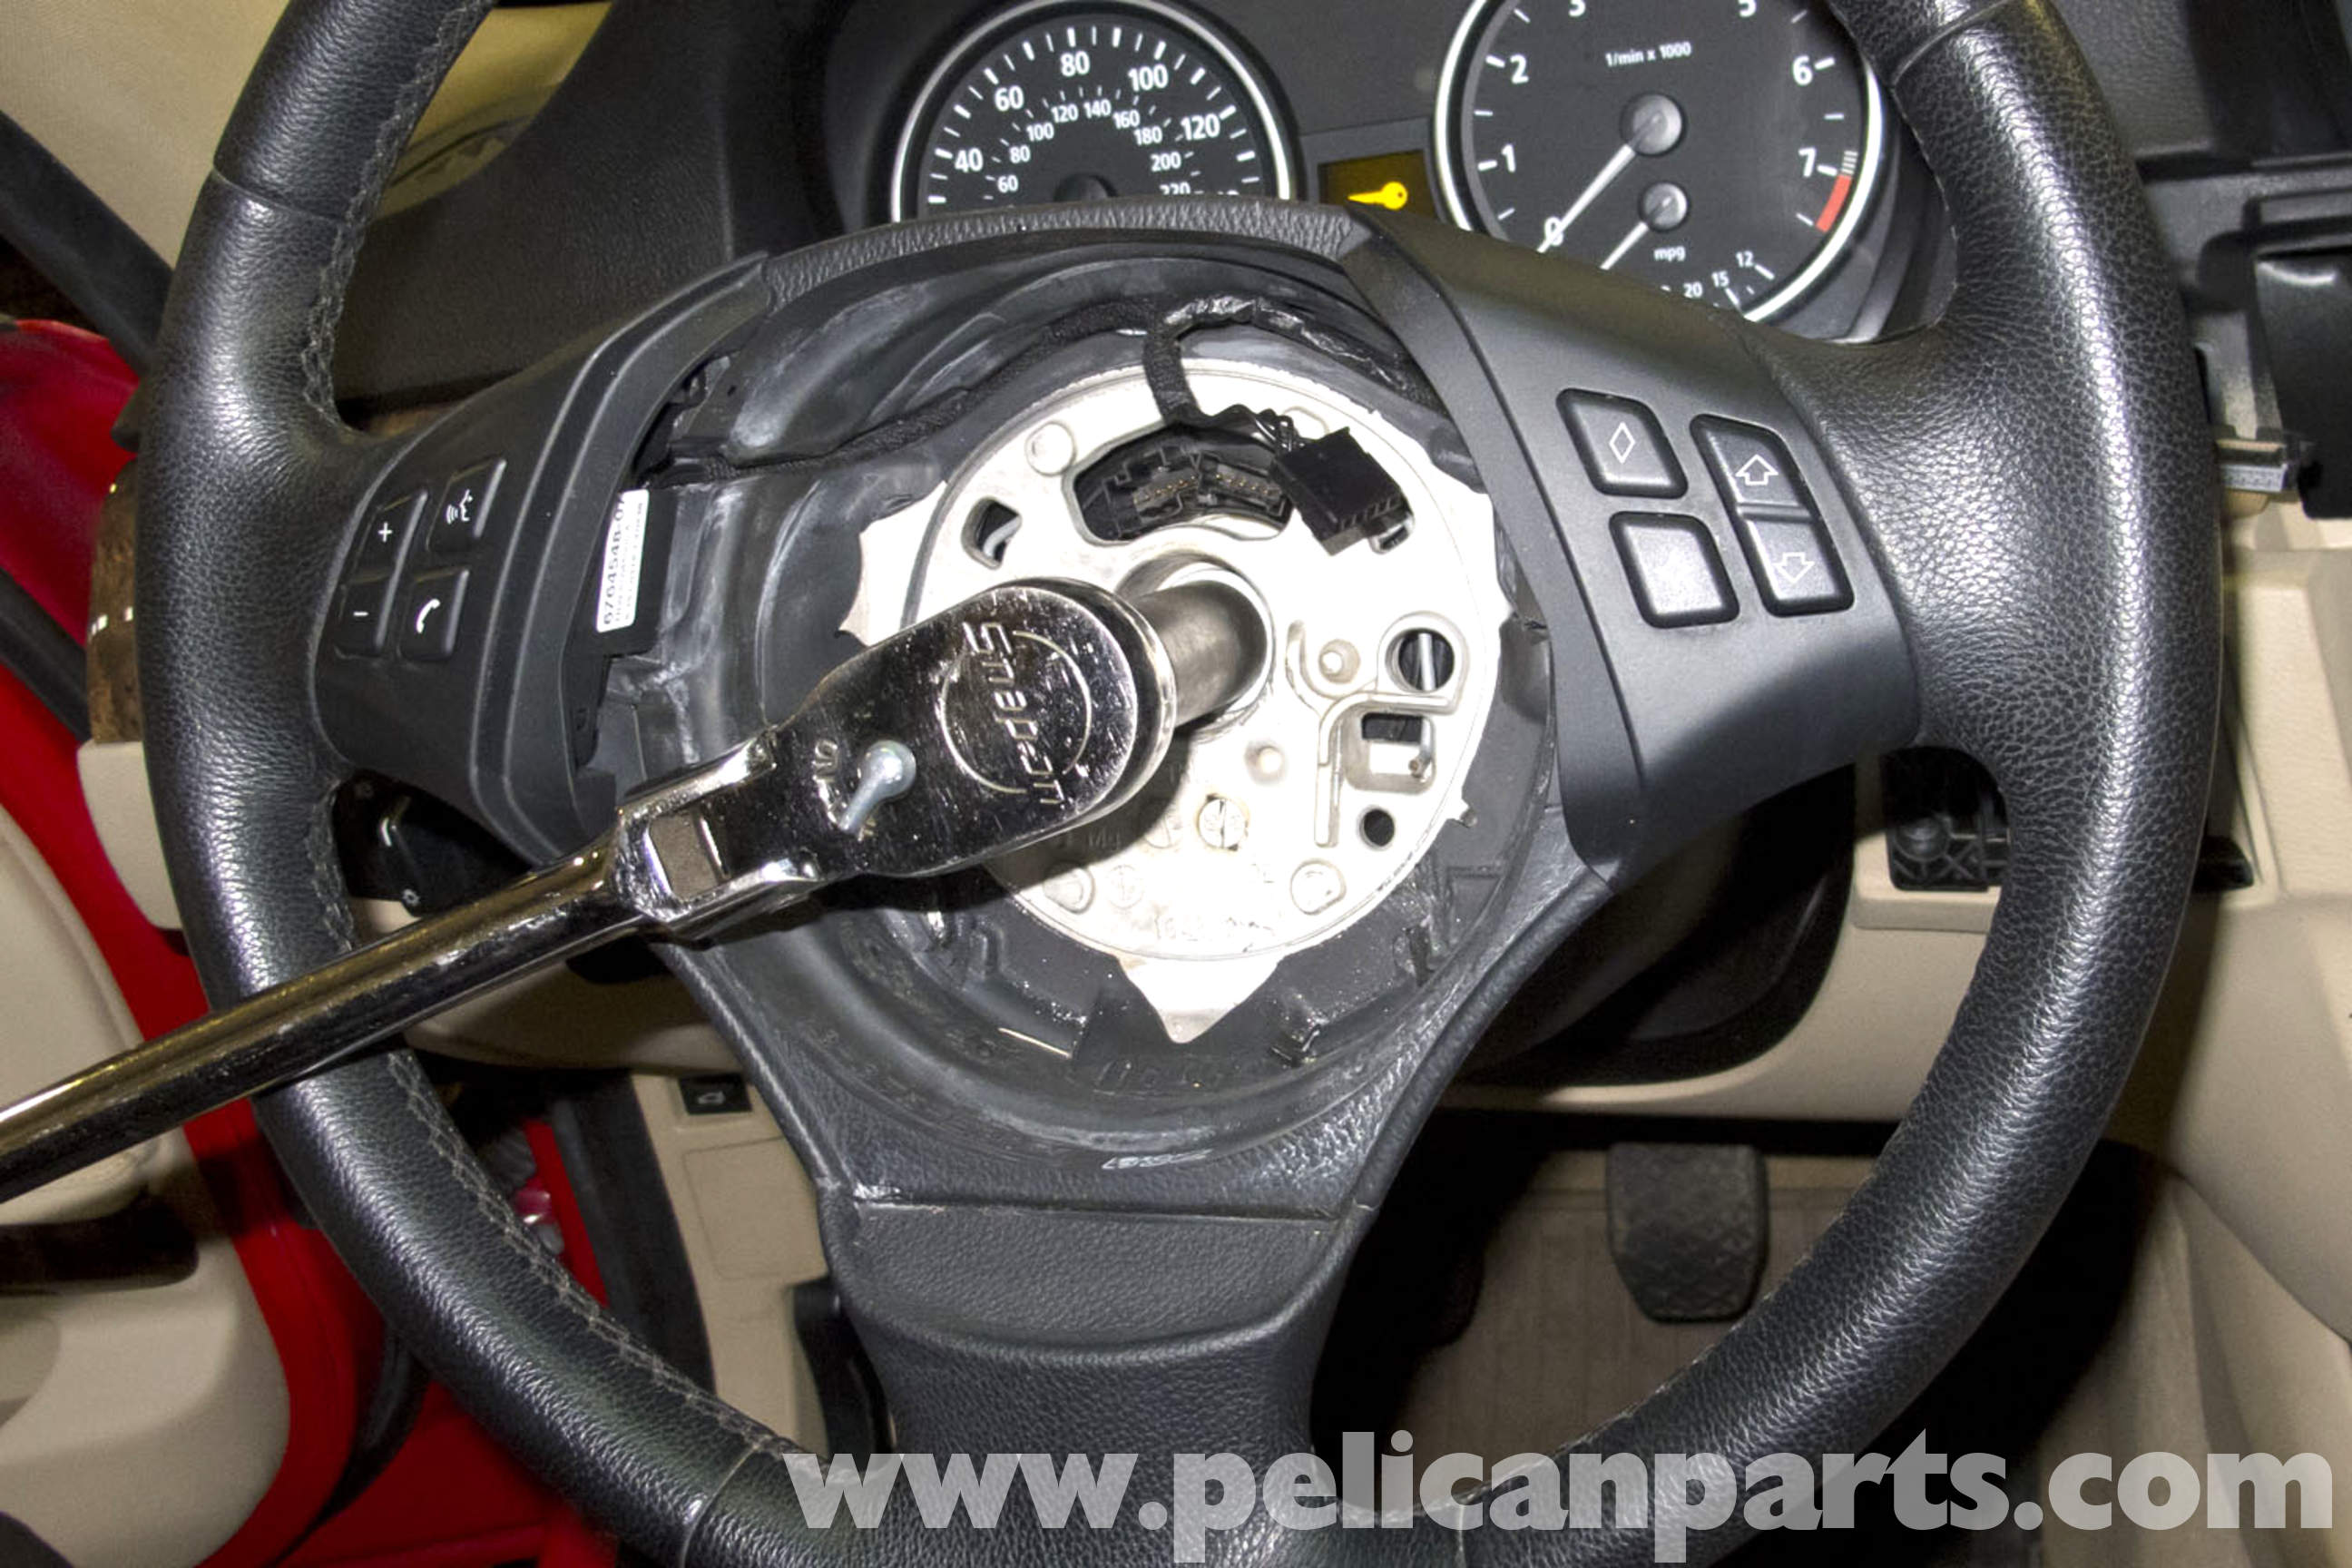 BMW E90 Steering Wheel Replacement | E91, E92, E93 | Pelican